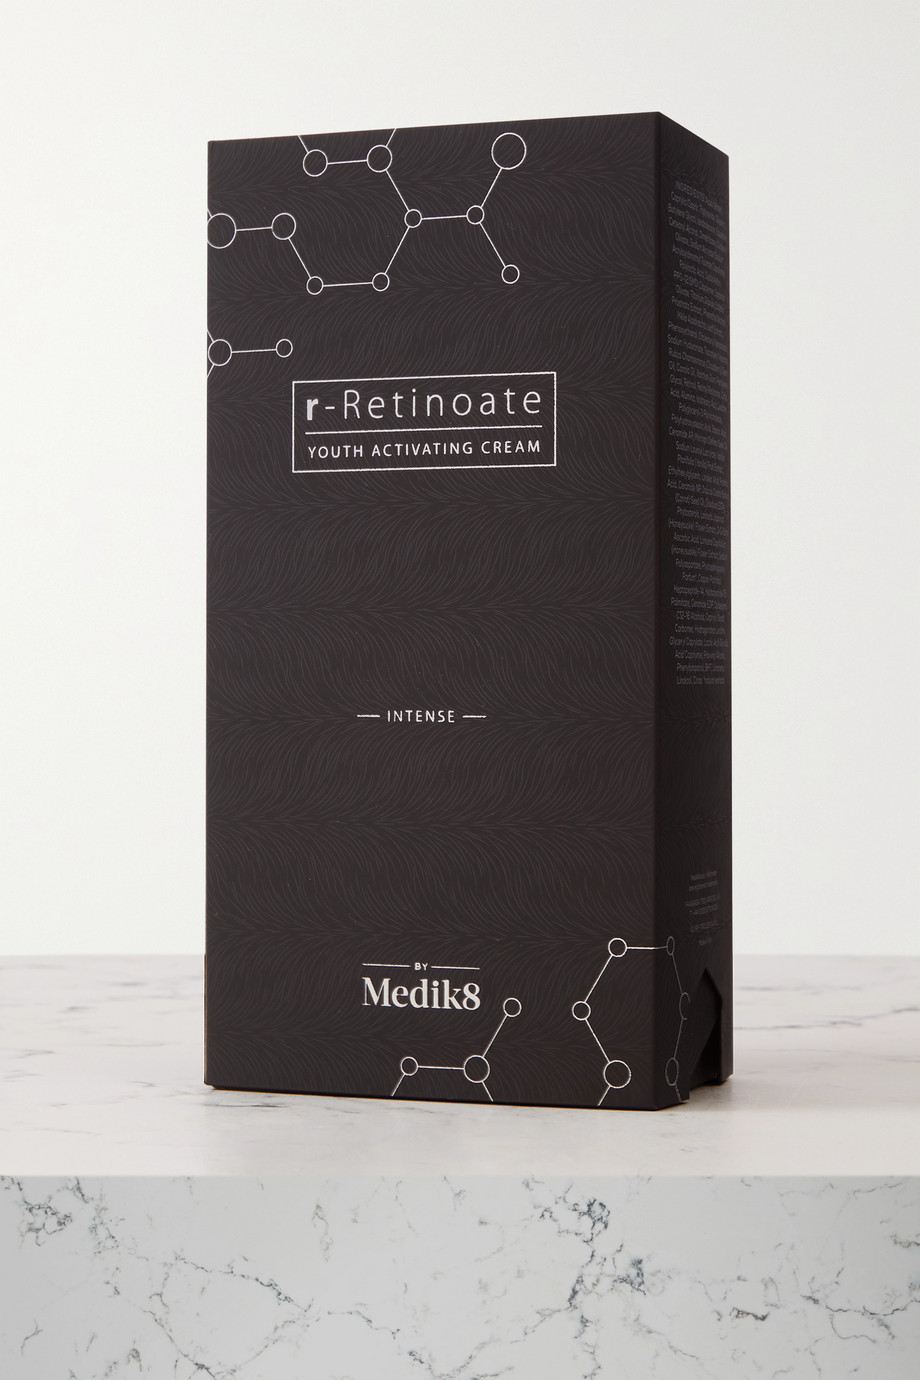 Medik8 Crème rajeunissante intense r-Retinoate, 50 ml